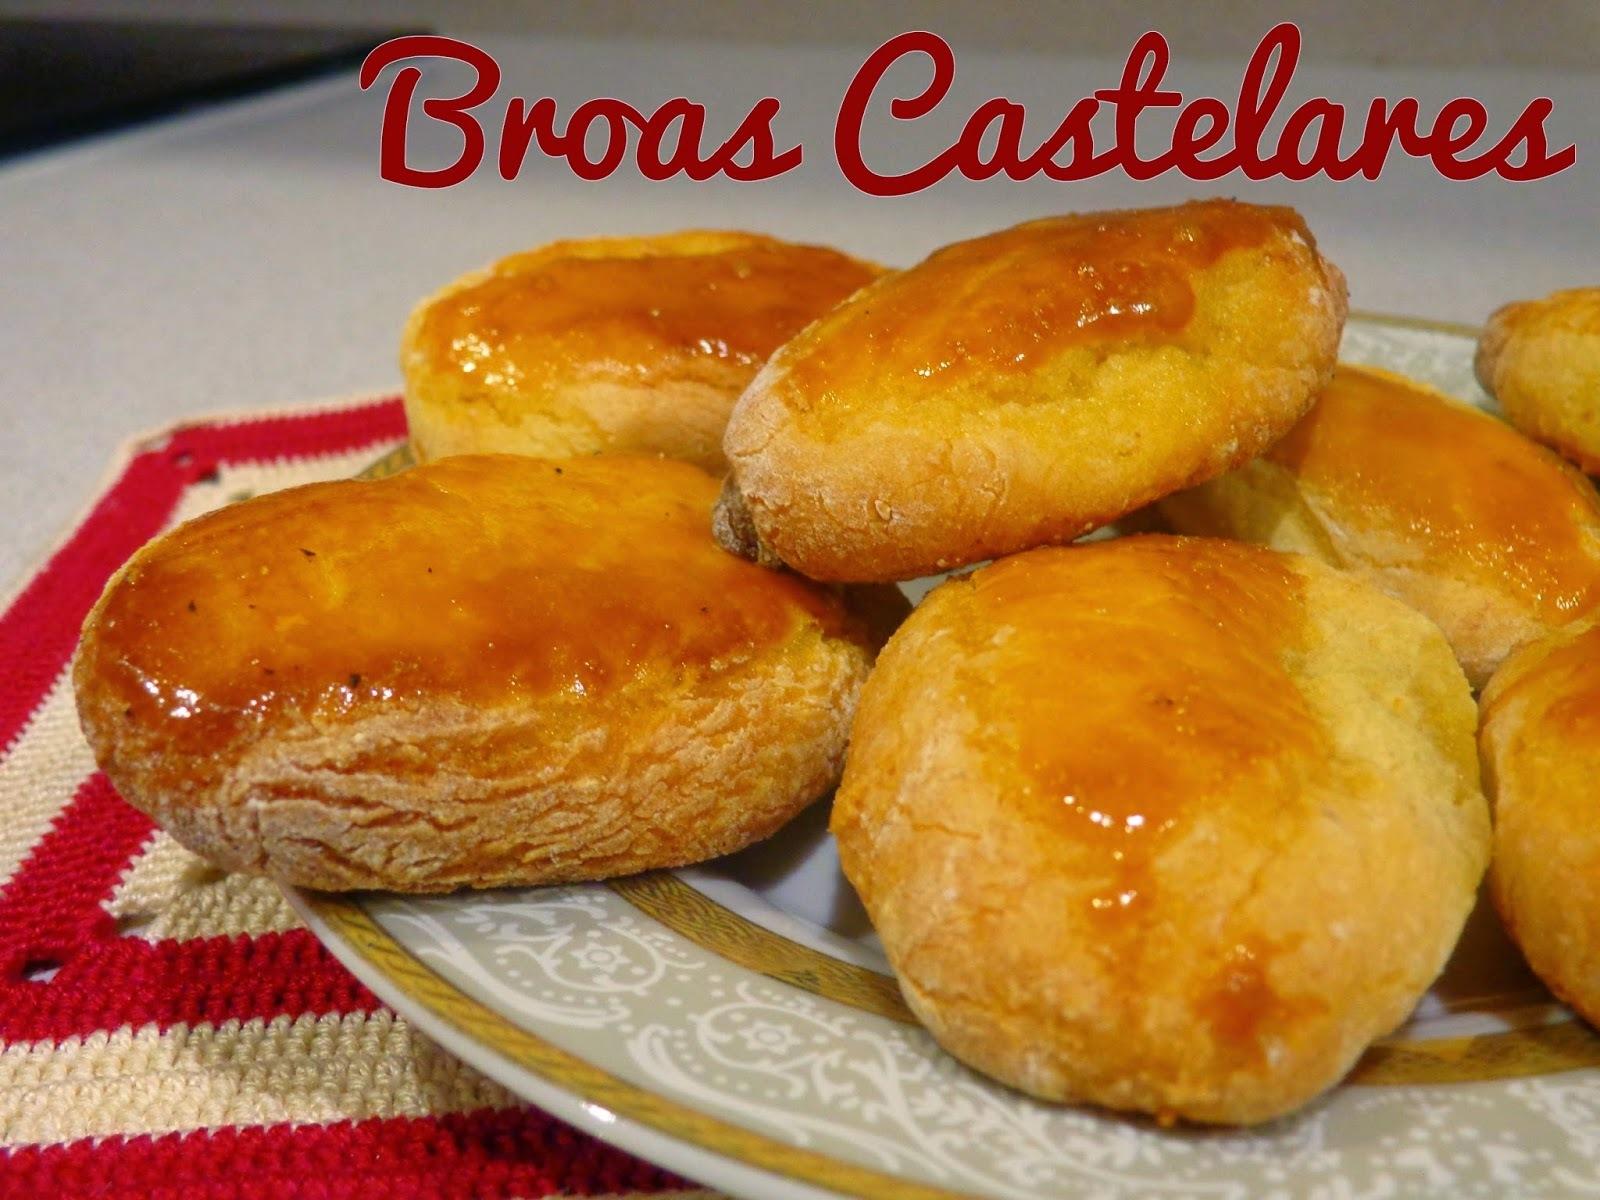 Broas Castelares